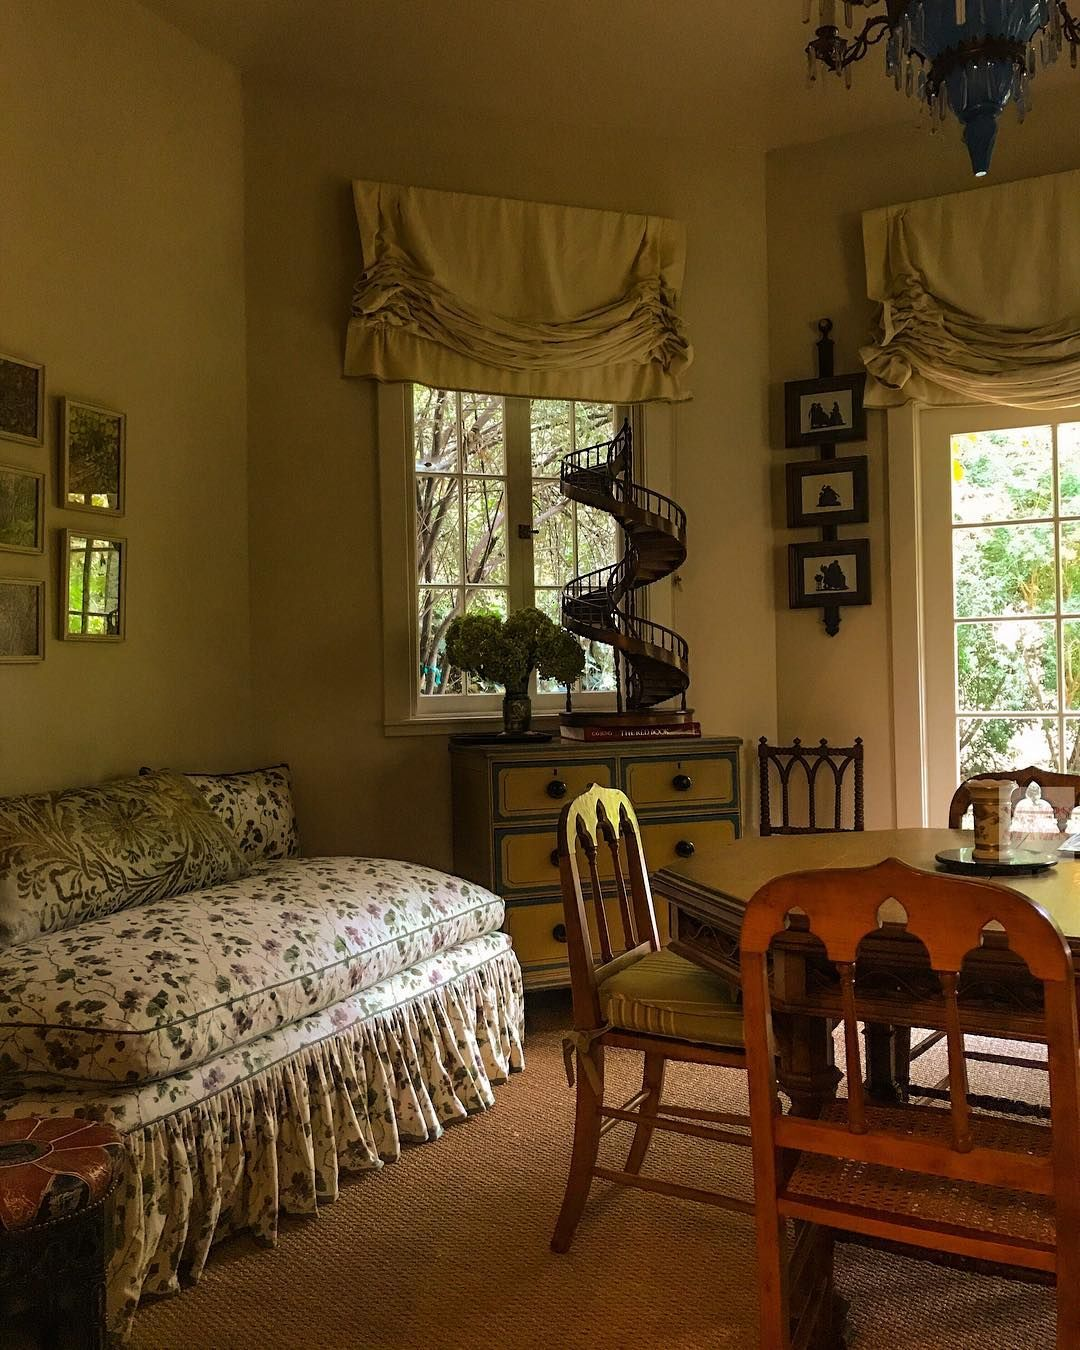 english cottage style english cottage interiors. Black Bedroom Furniture Sets. Home Design Ideas